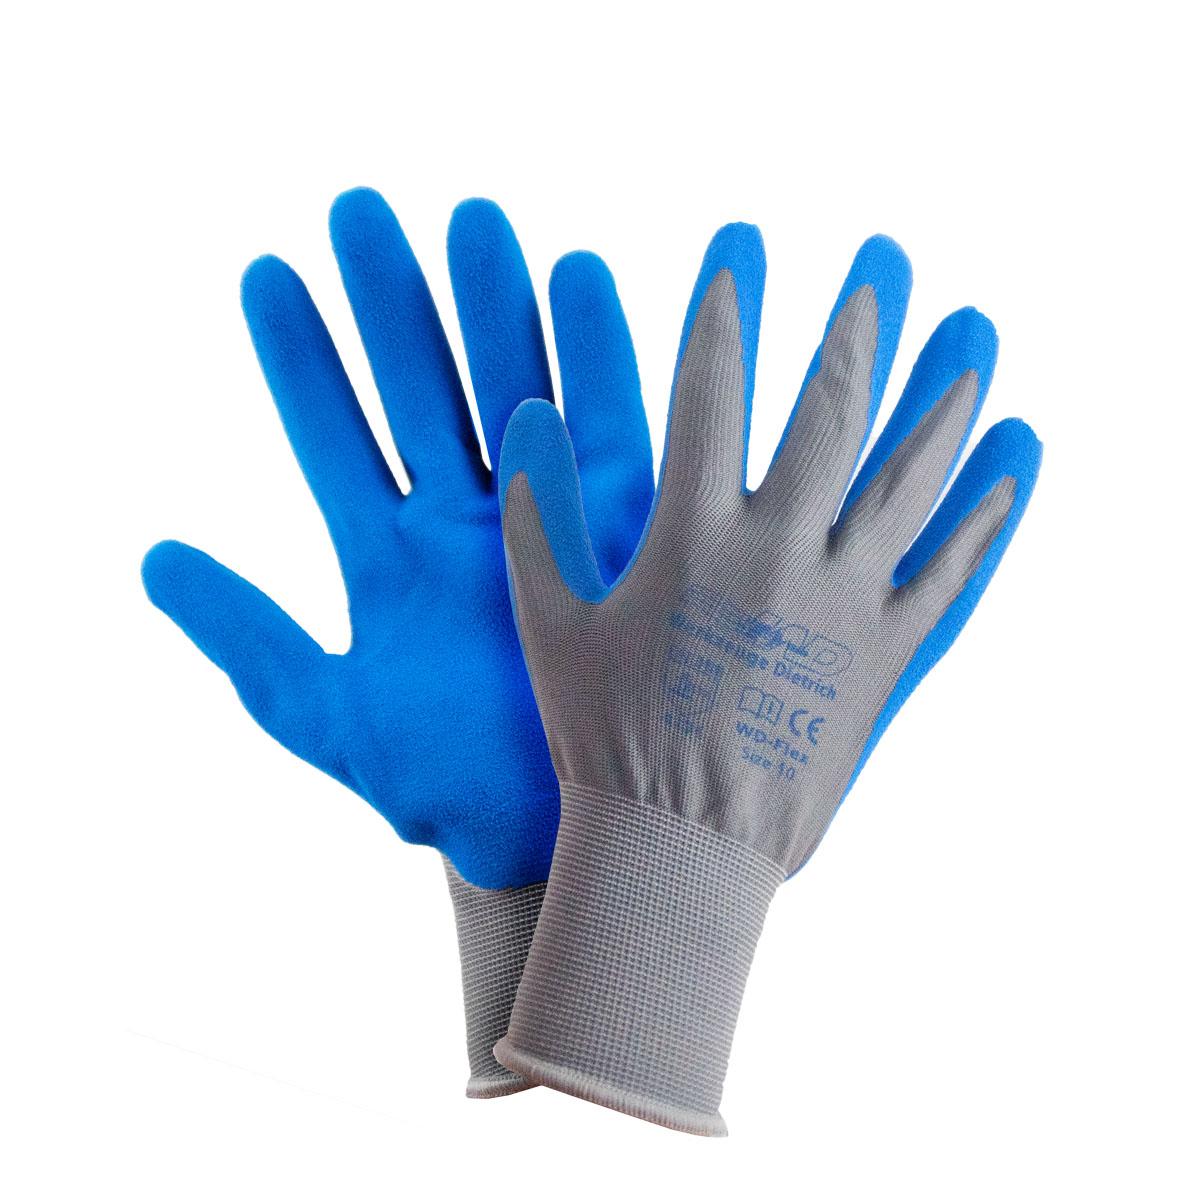 Flex-Handschuhe grau/blau 9